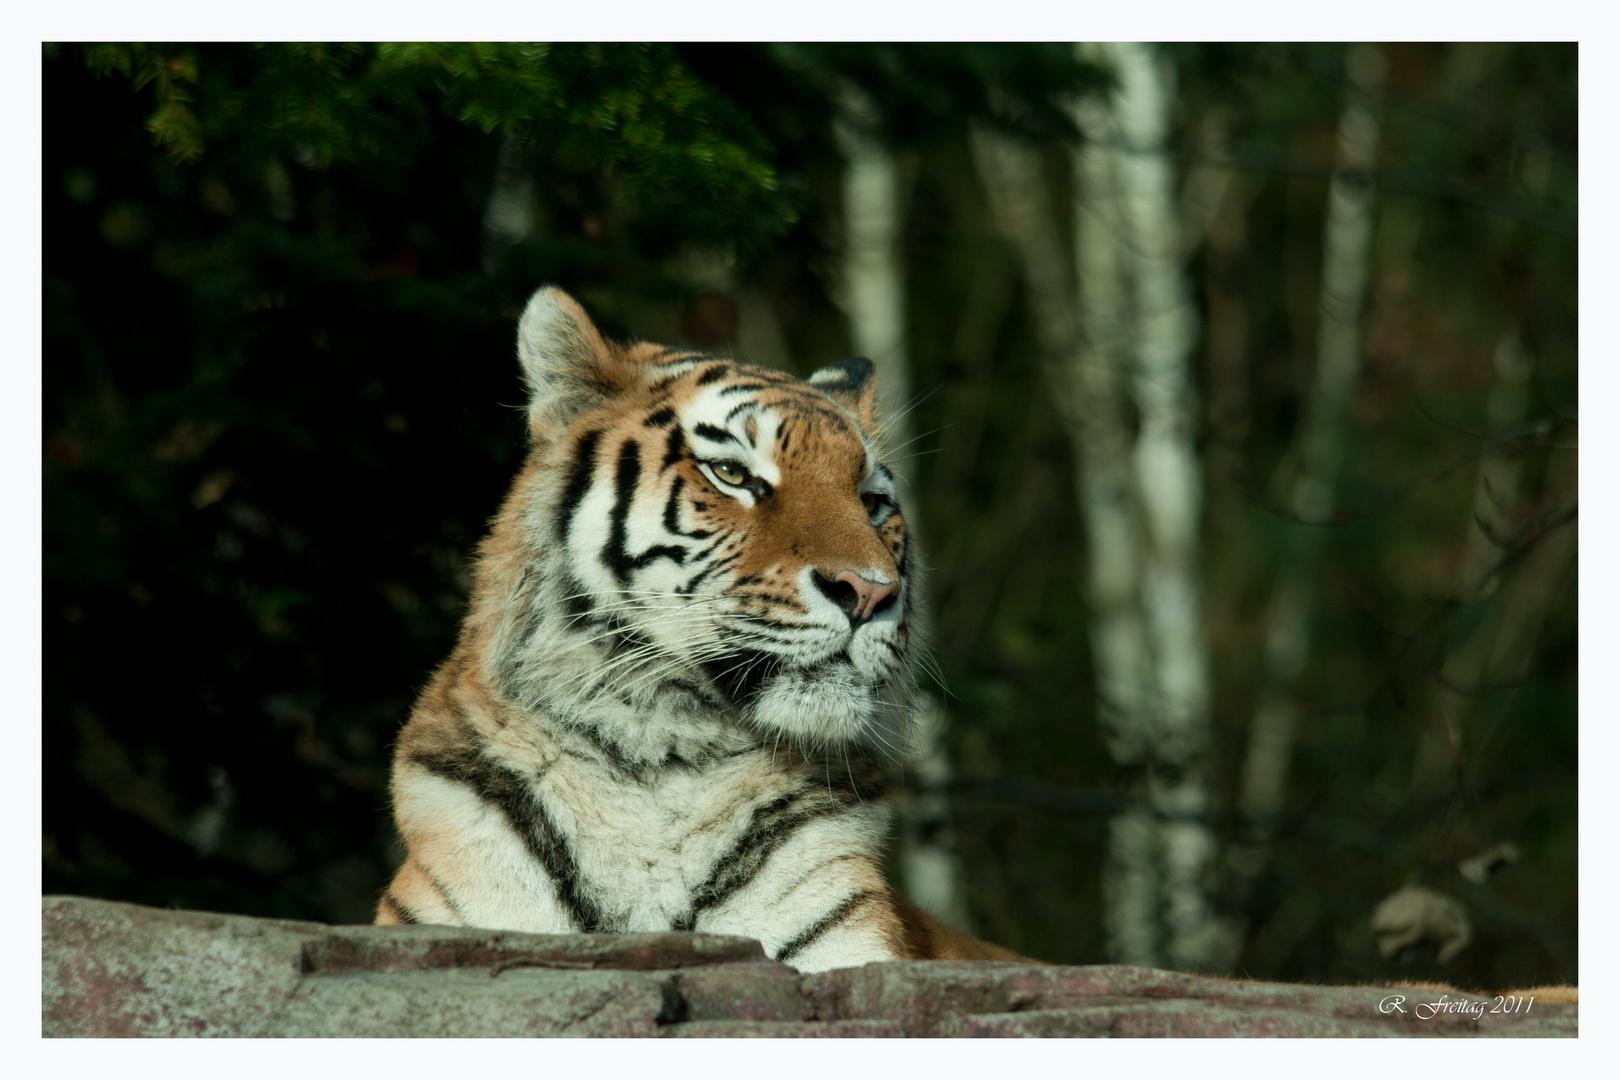 Tiger am frühen Morgen